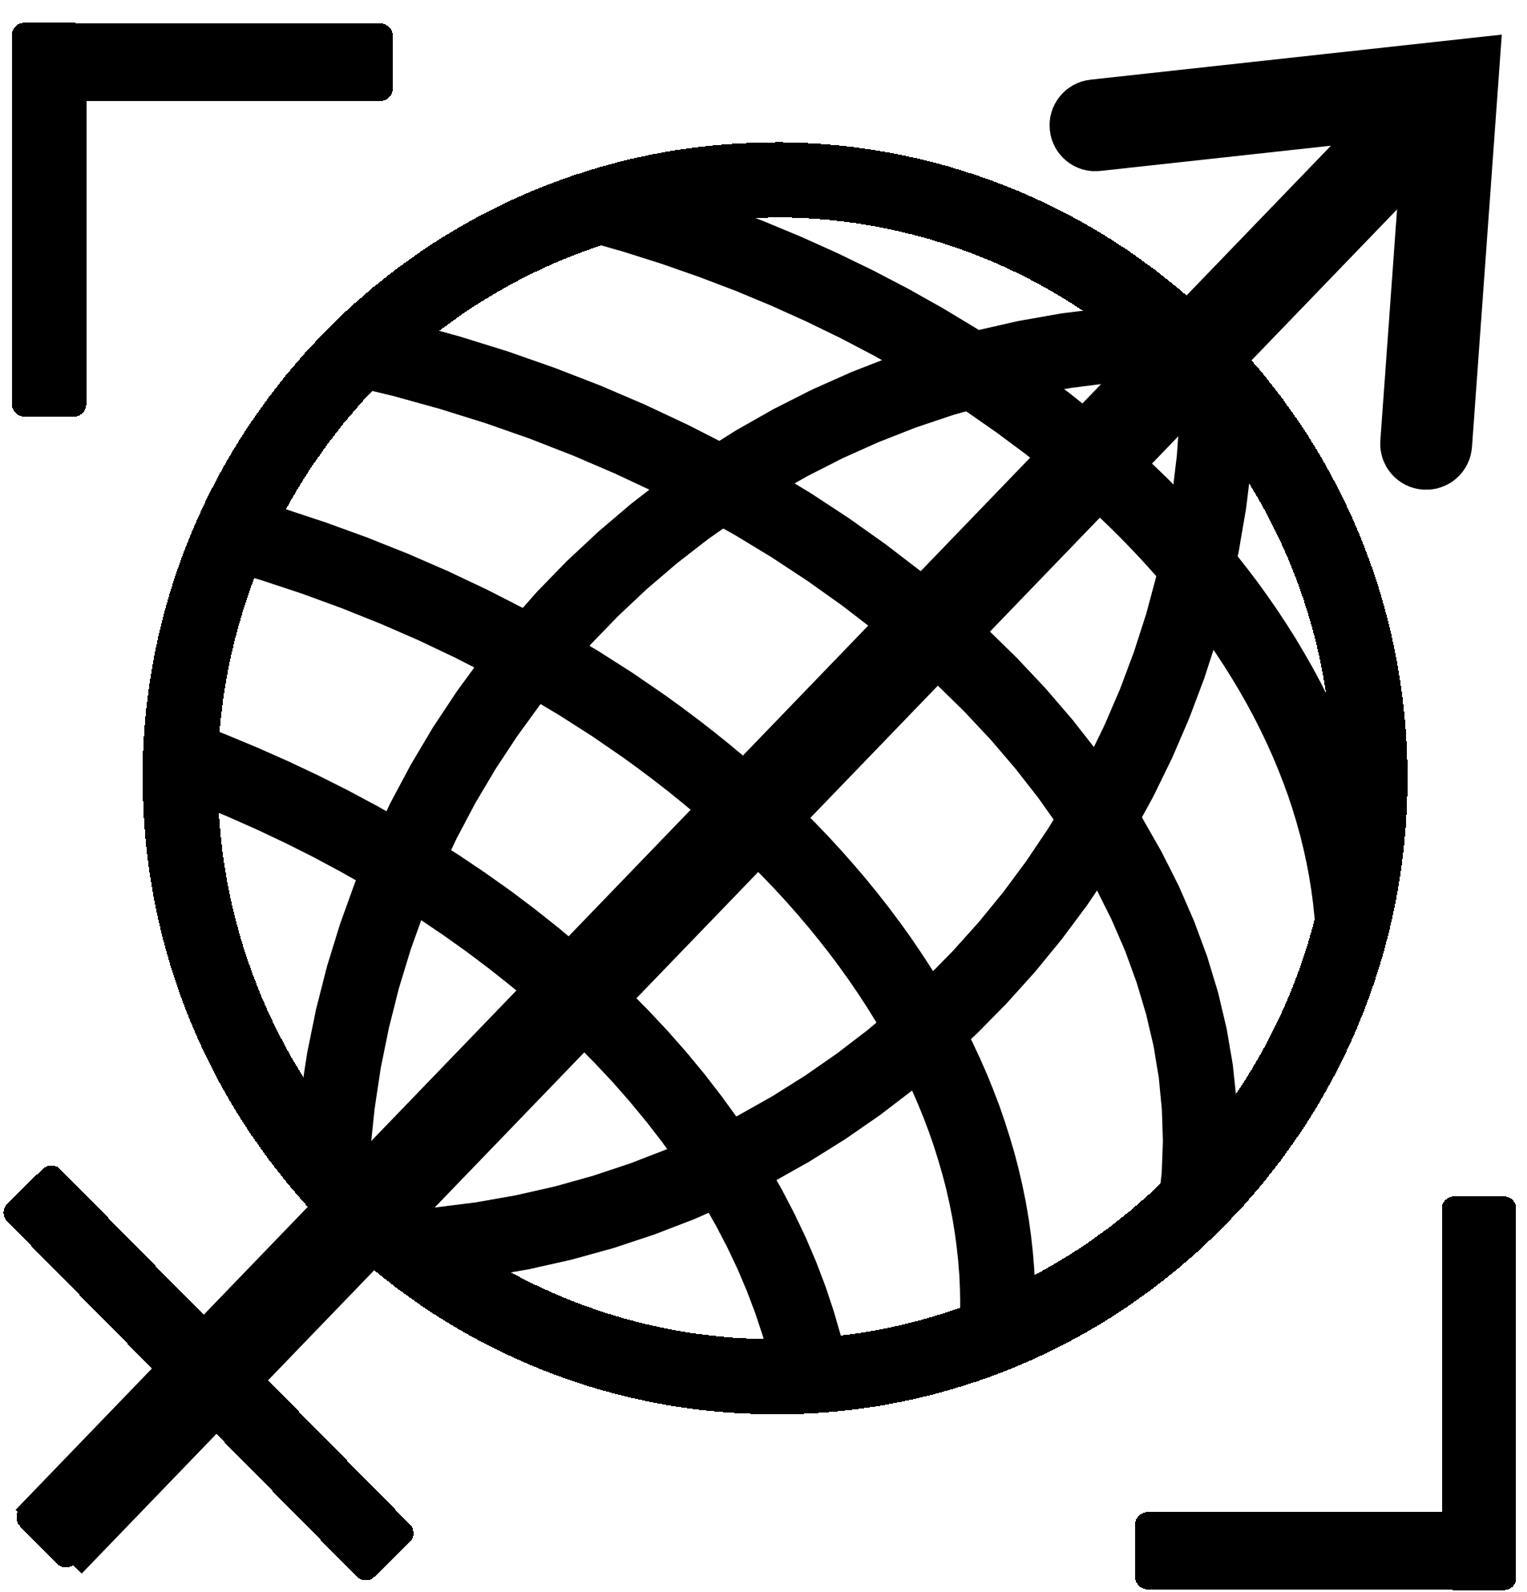 cgs-logo-large.jpg